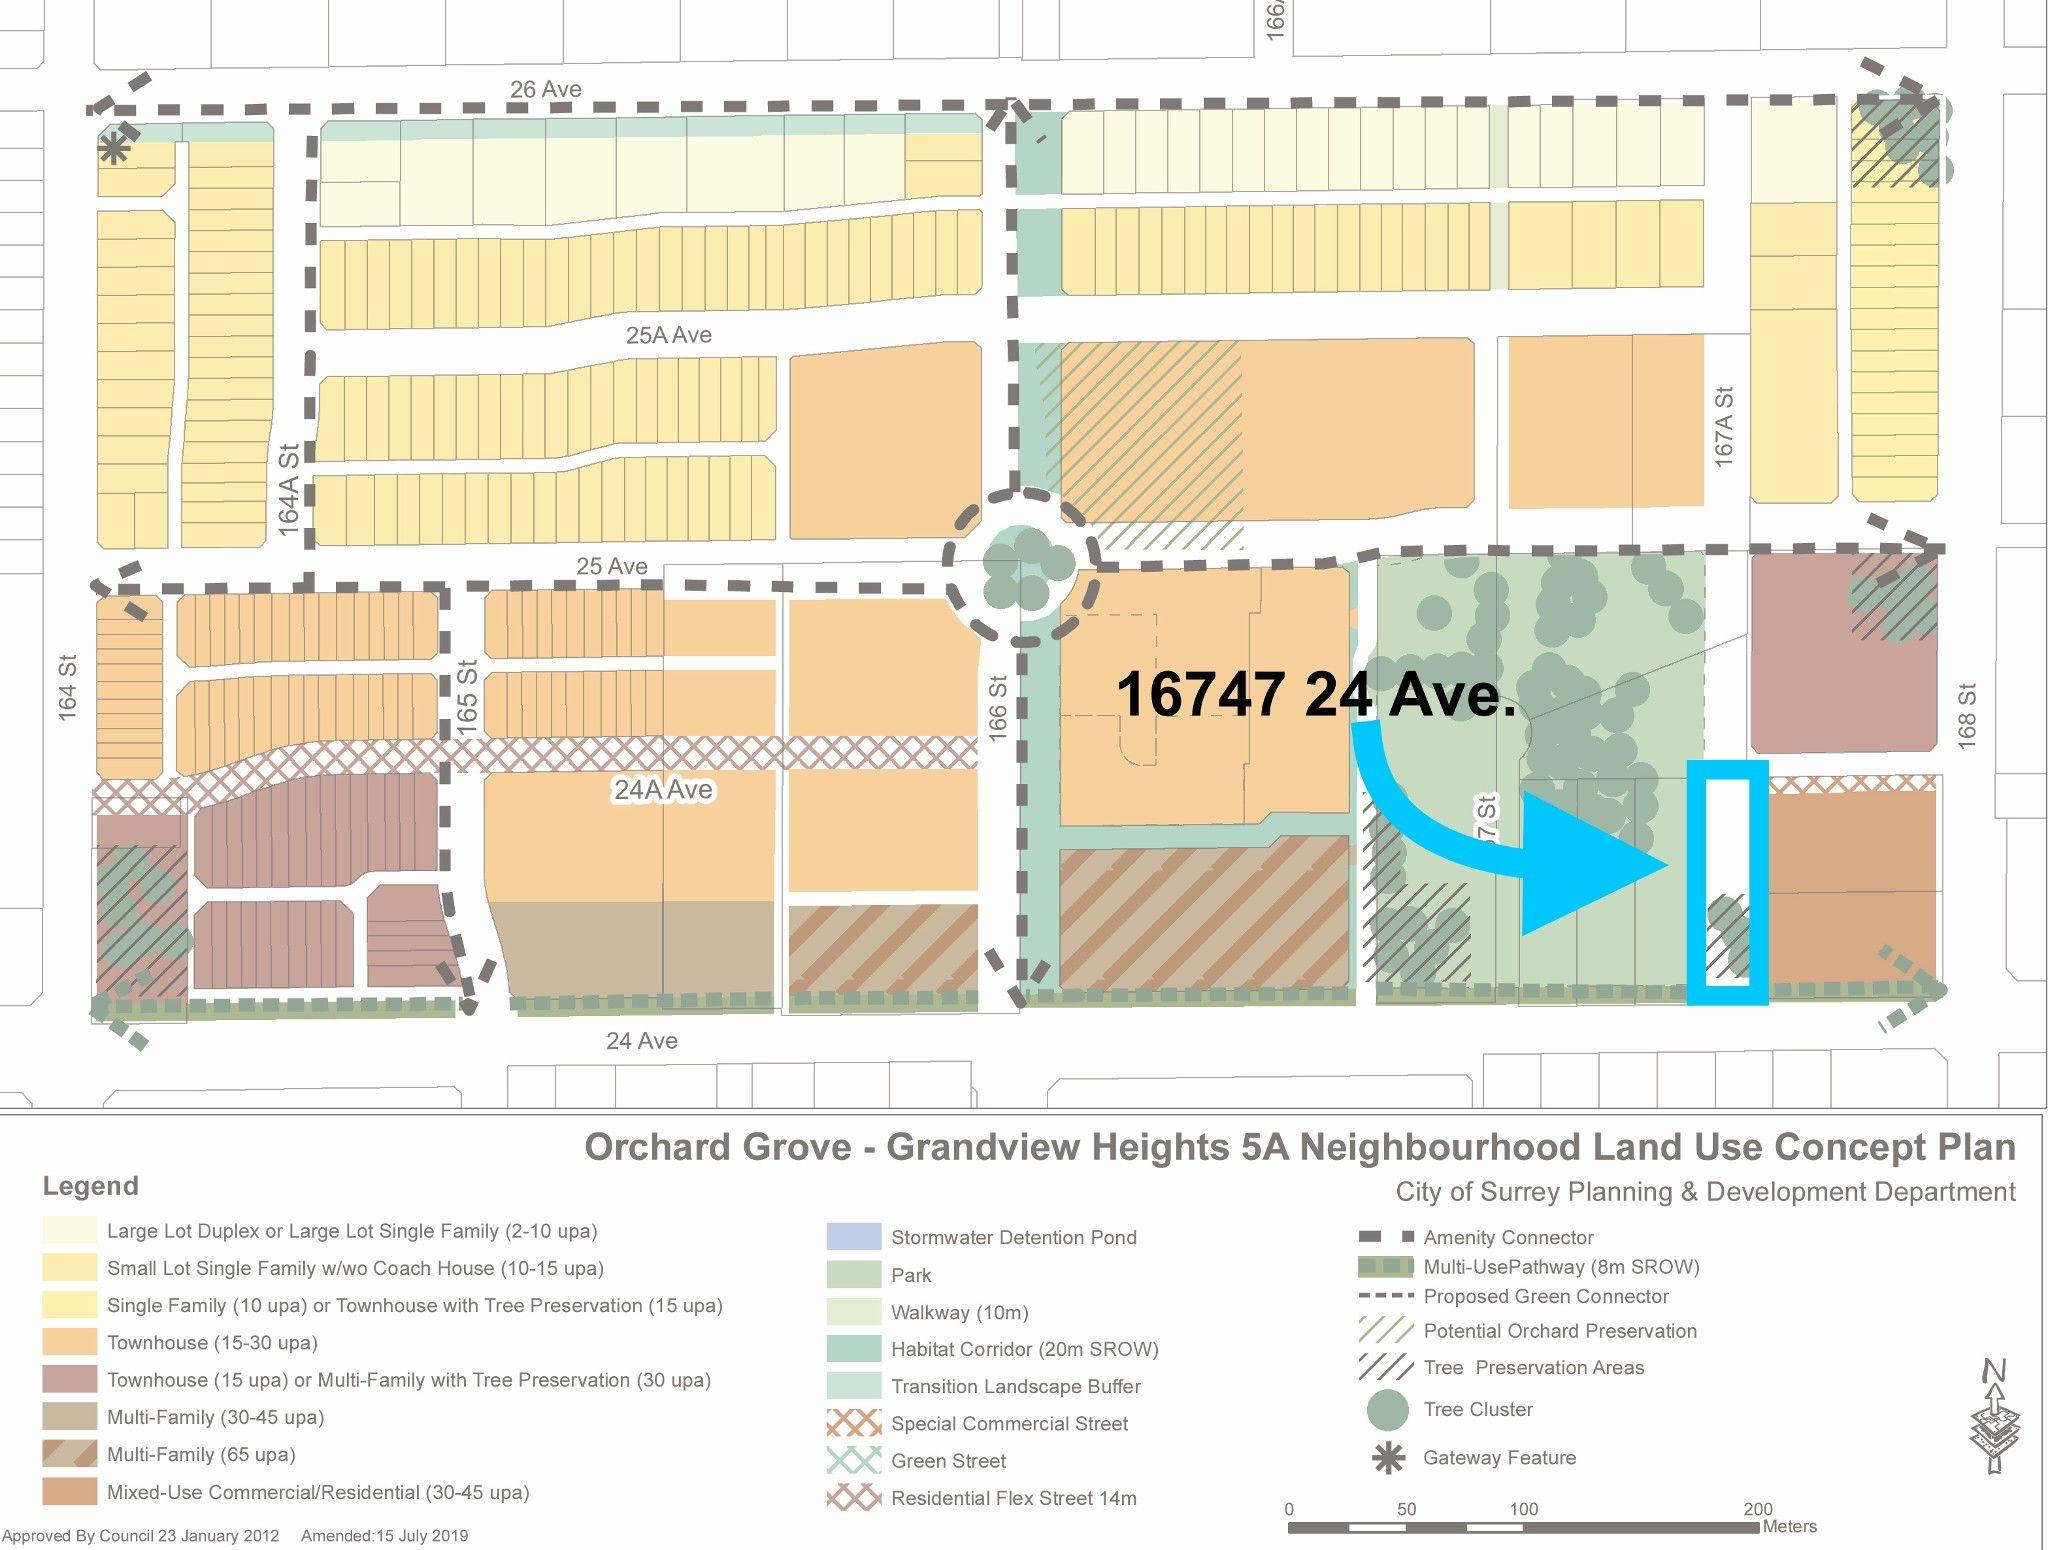 Main Photo: 16747 24 Avenue in surrey: Grandview Surrey Land for sale (South Surrey White Rock)